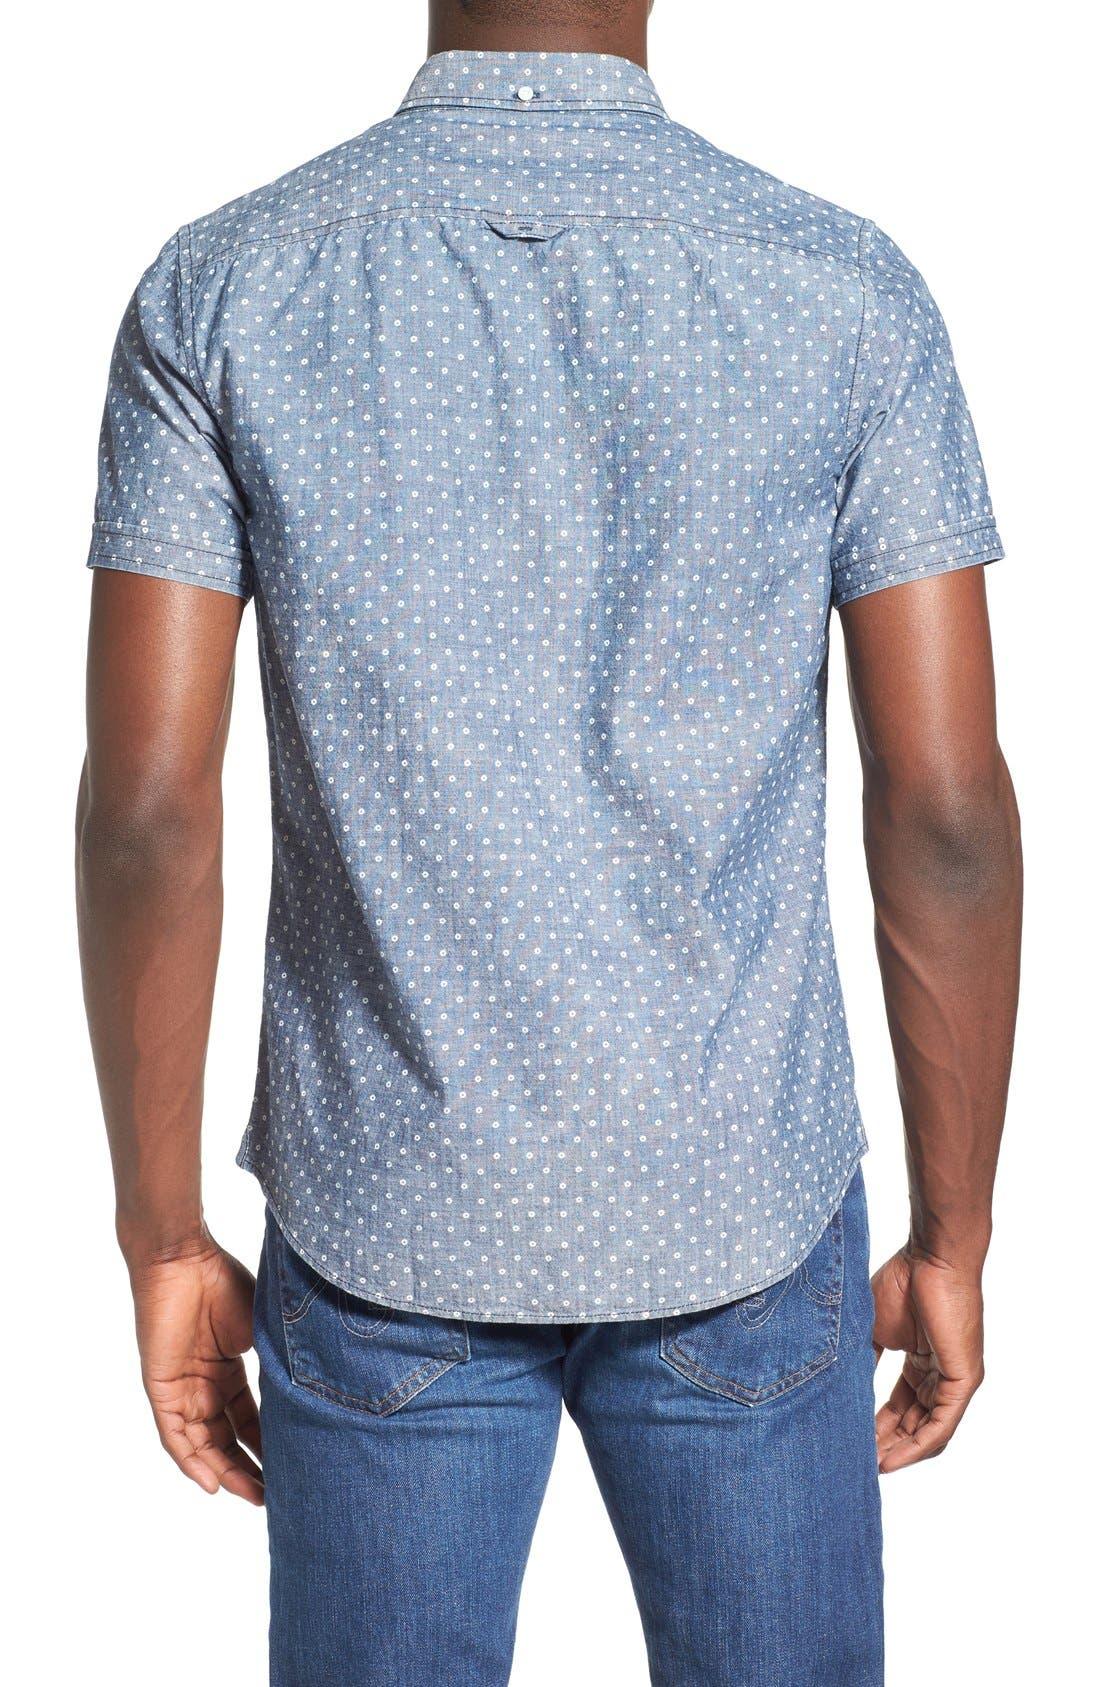 Alternate Image 2  - 1901 'Whitman' Trim Fit Short Sleeve Dot Print Chambray Shirt